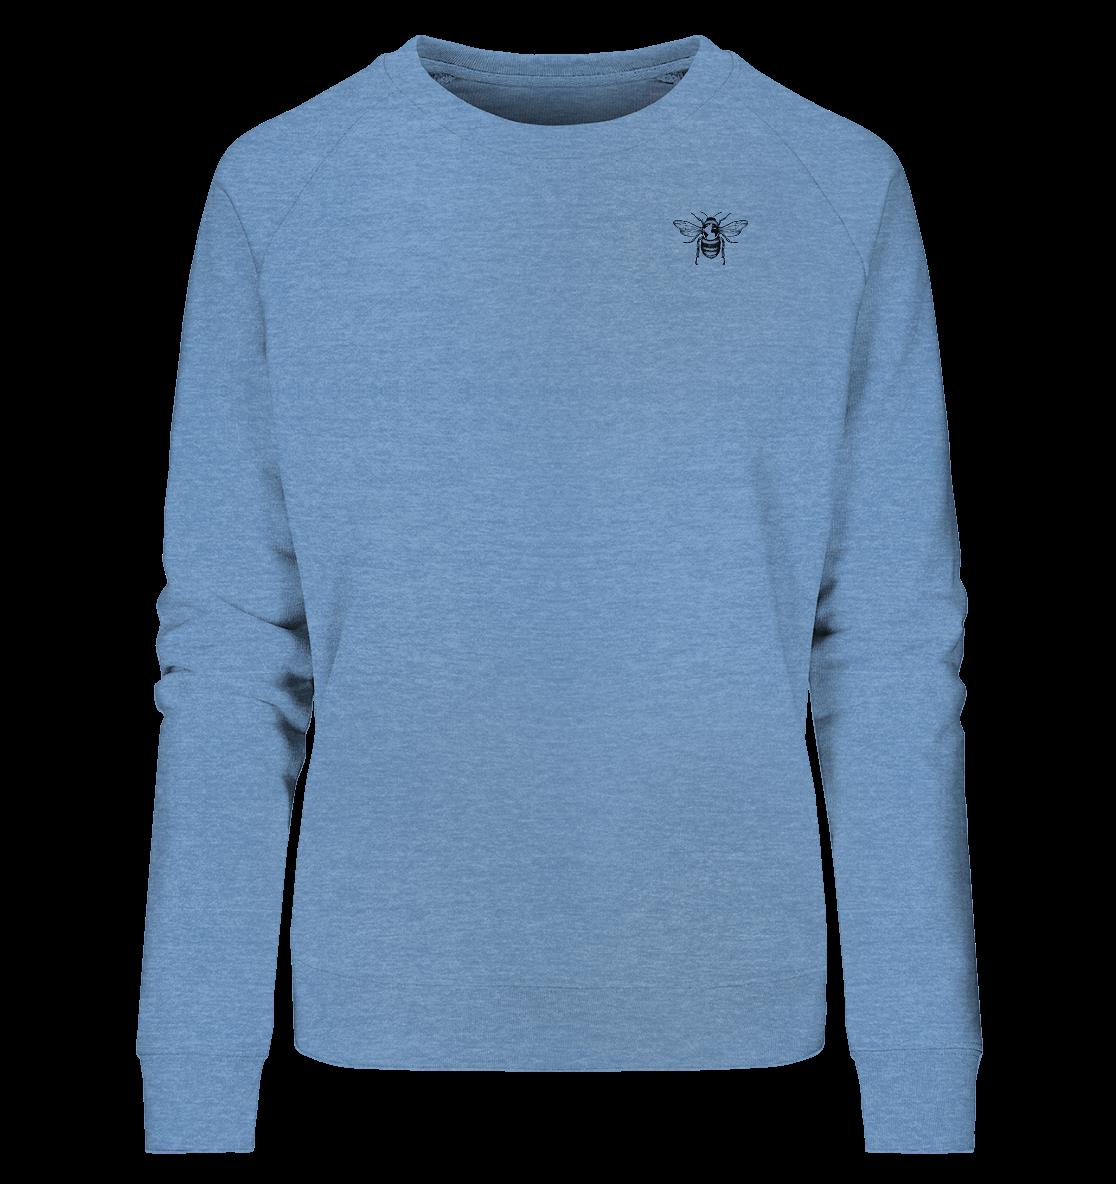 front-ladies-organic-sweatshirt-6090c4-1116x.png